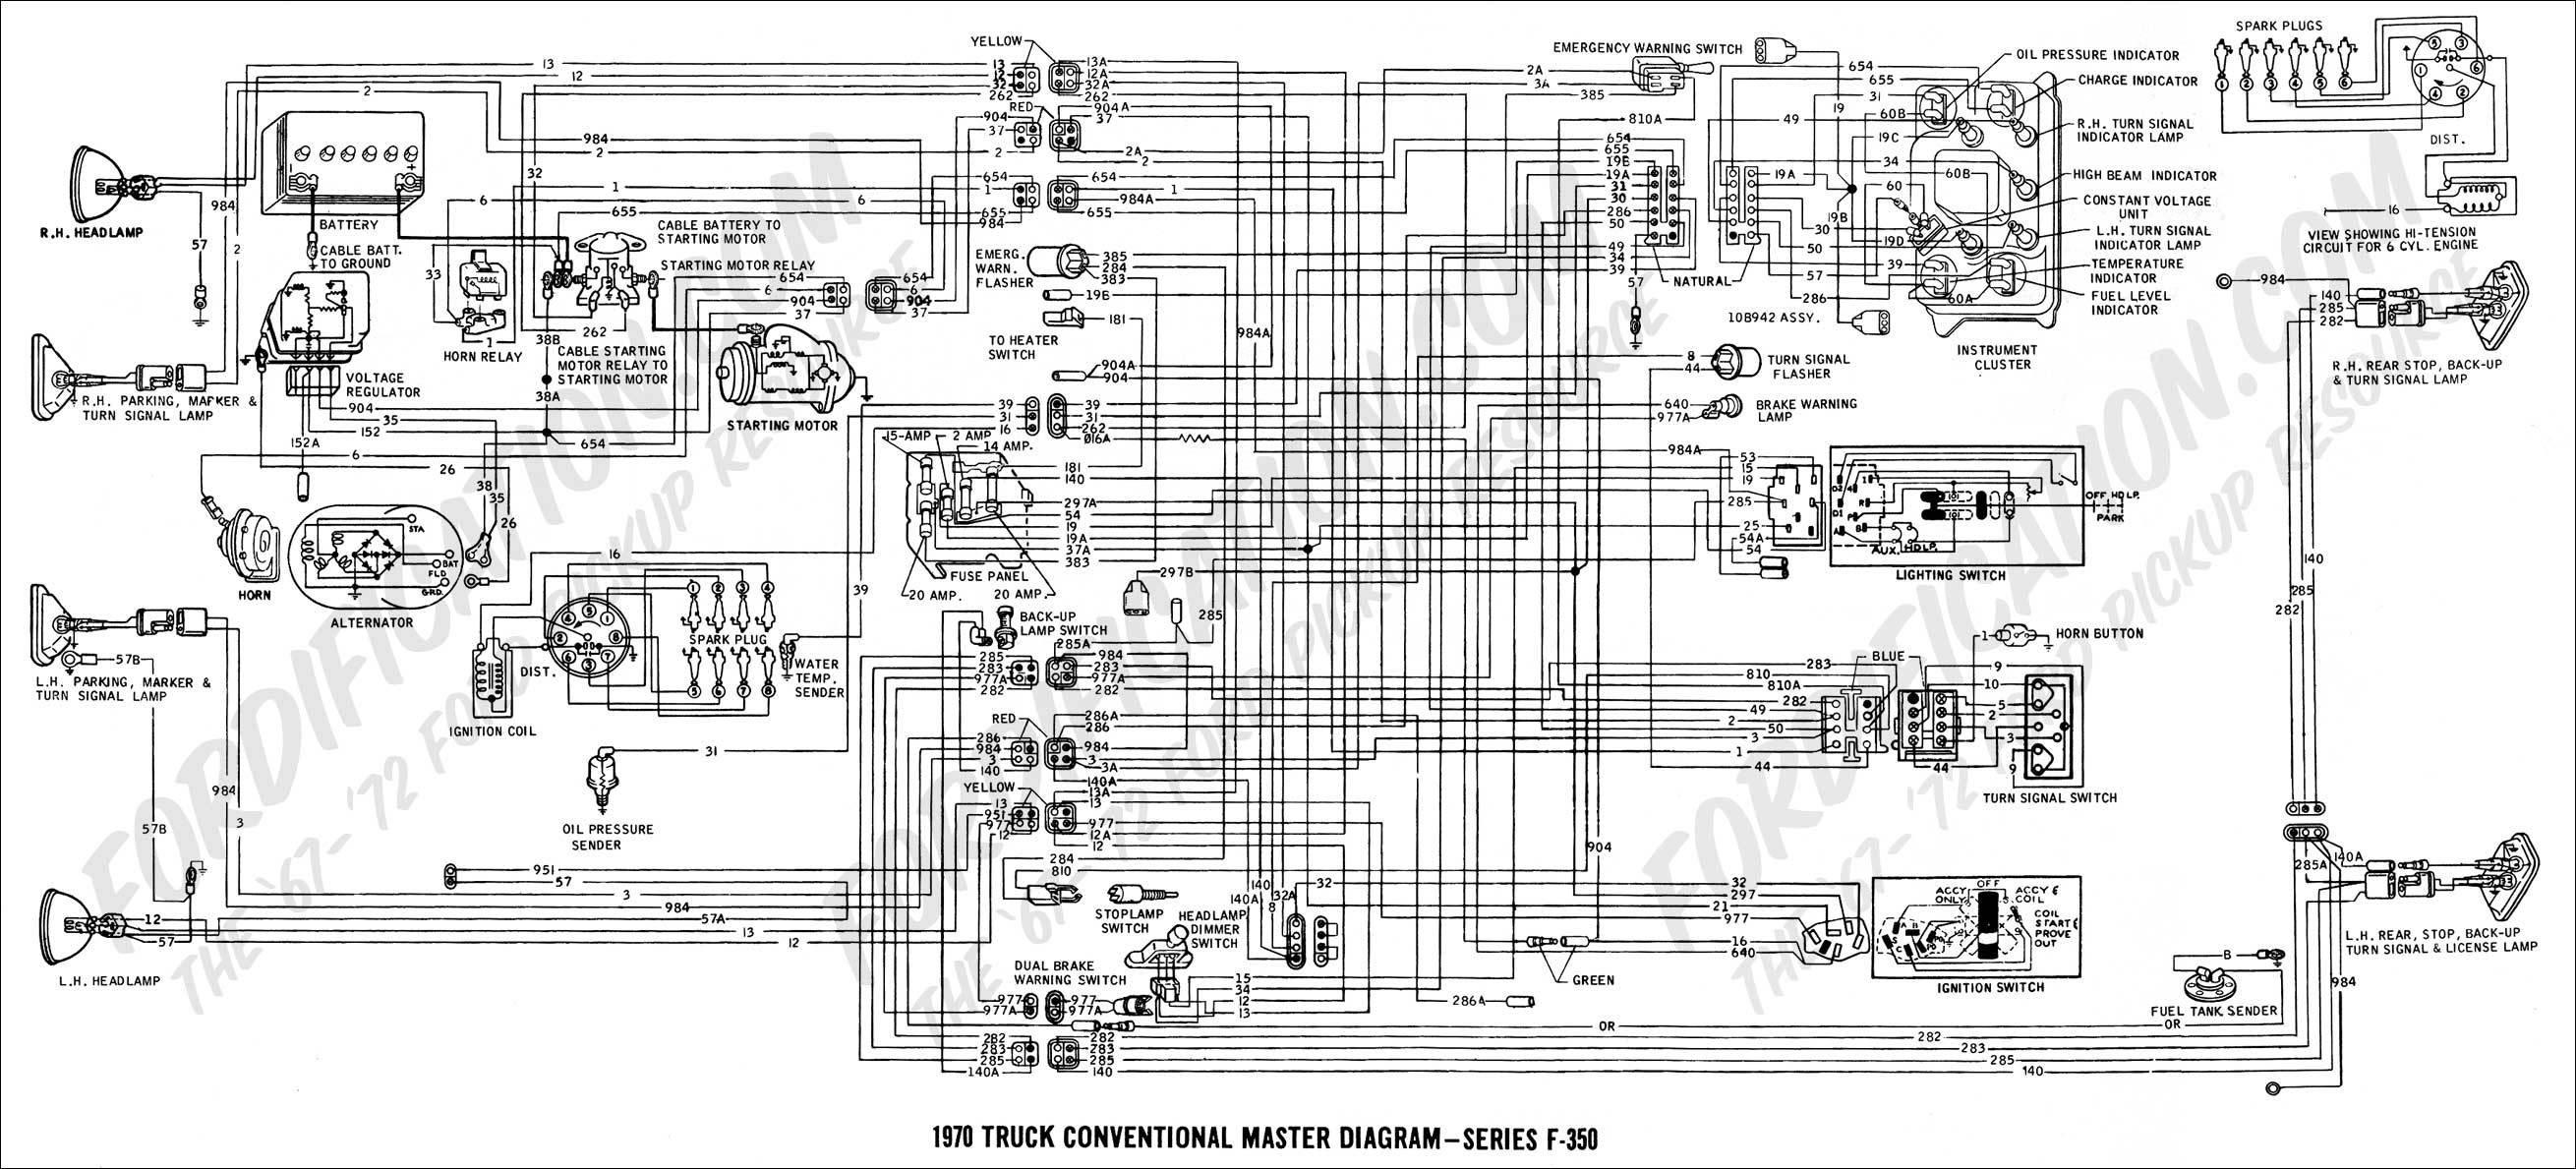 1997 Ford F350 Wiring Diagram from detoxicrecenze.com